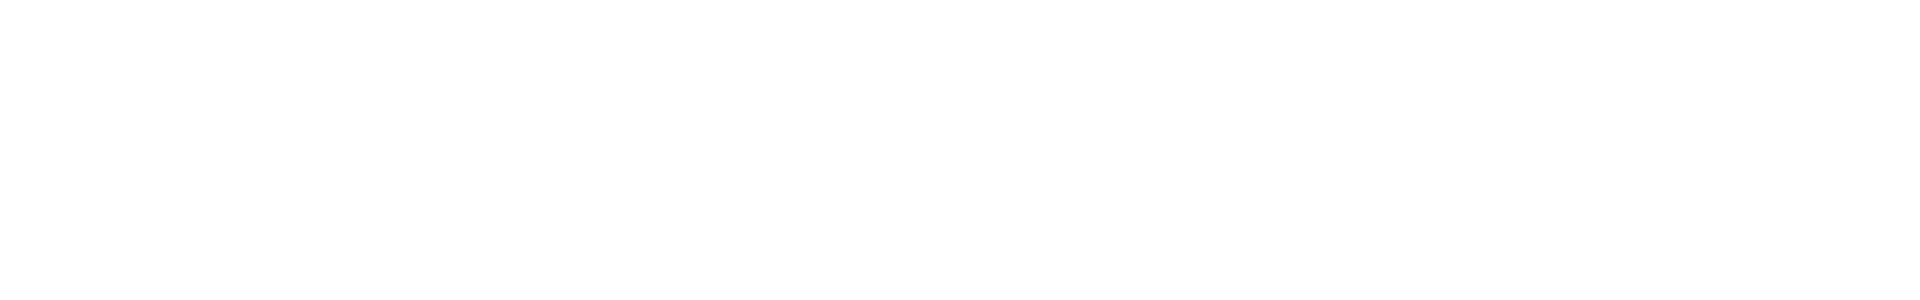 wit tussenvlak 1920x300 px_20210510090626734